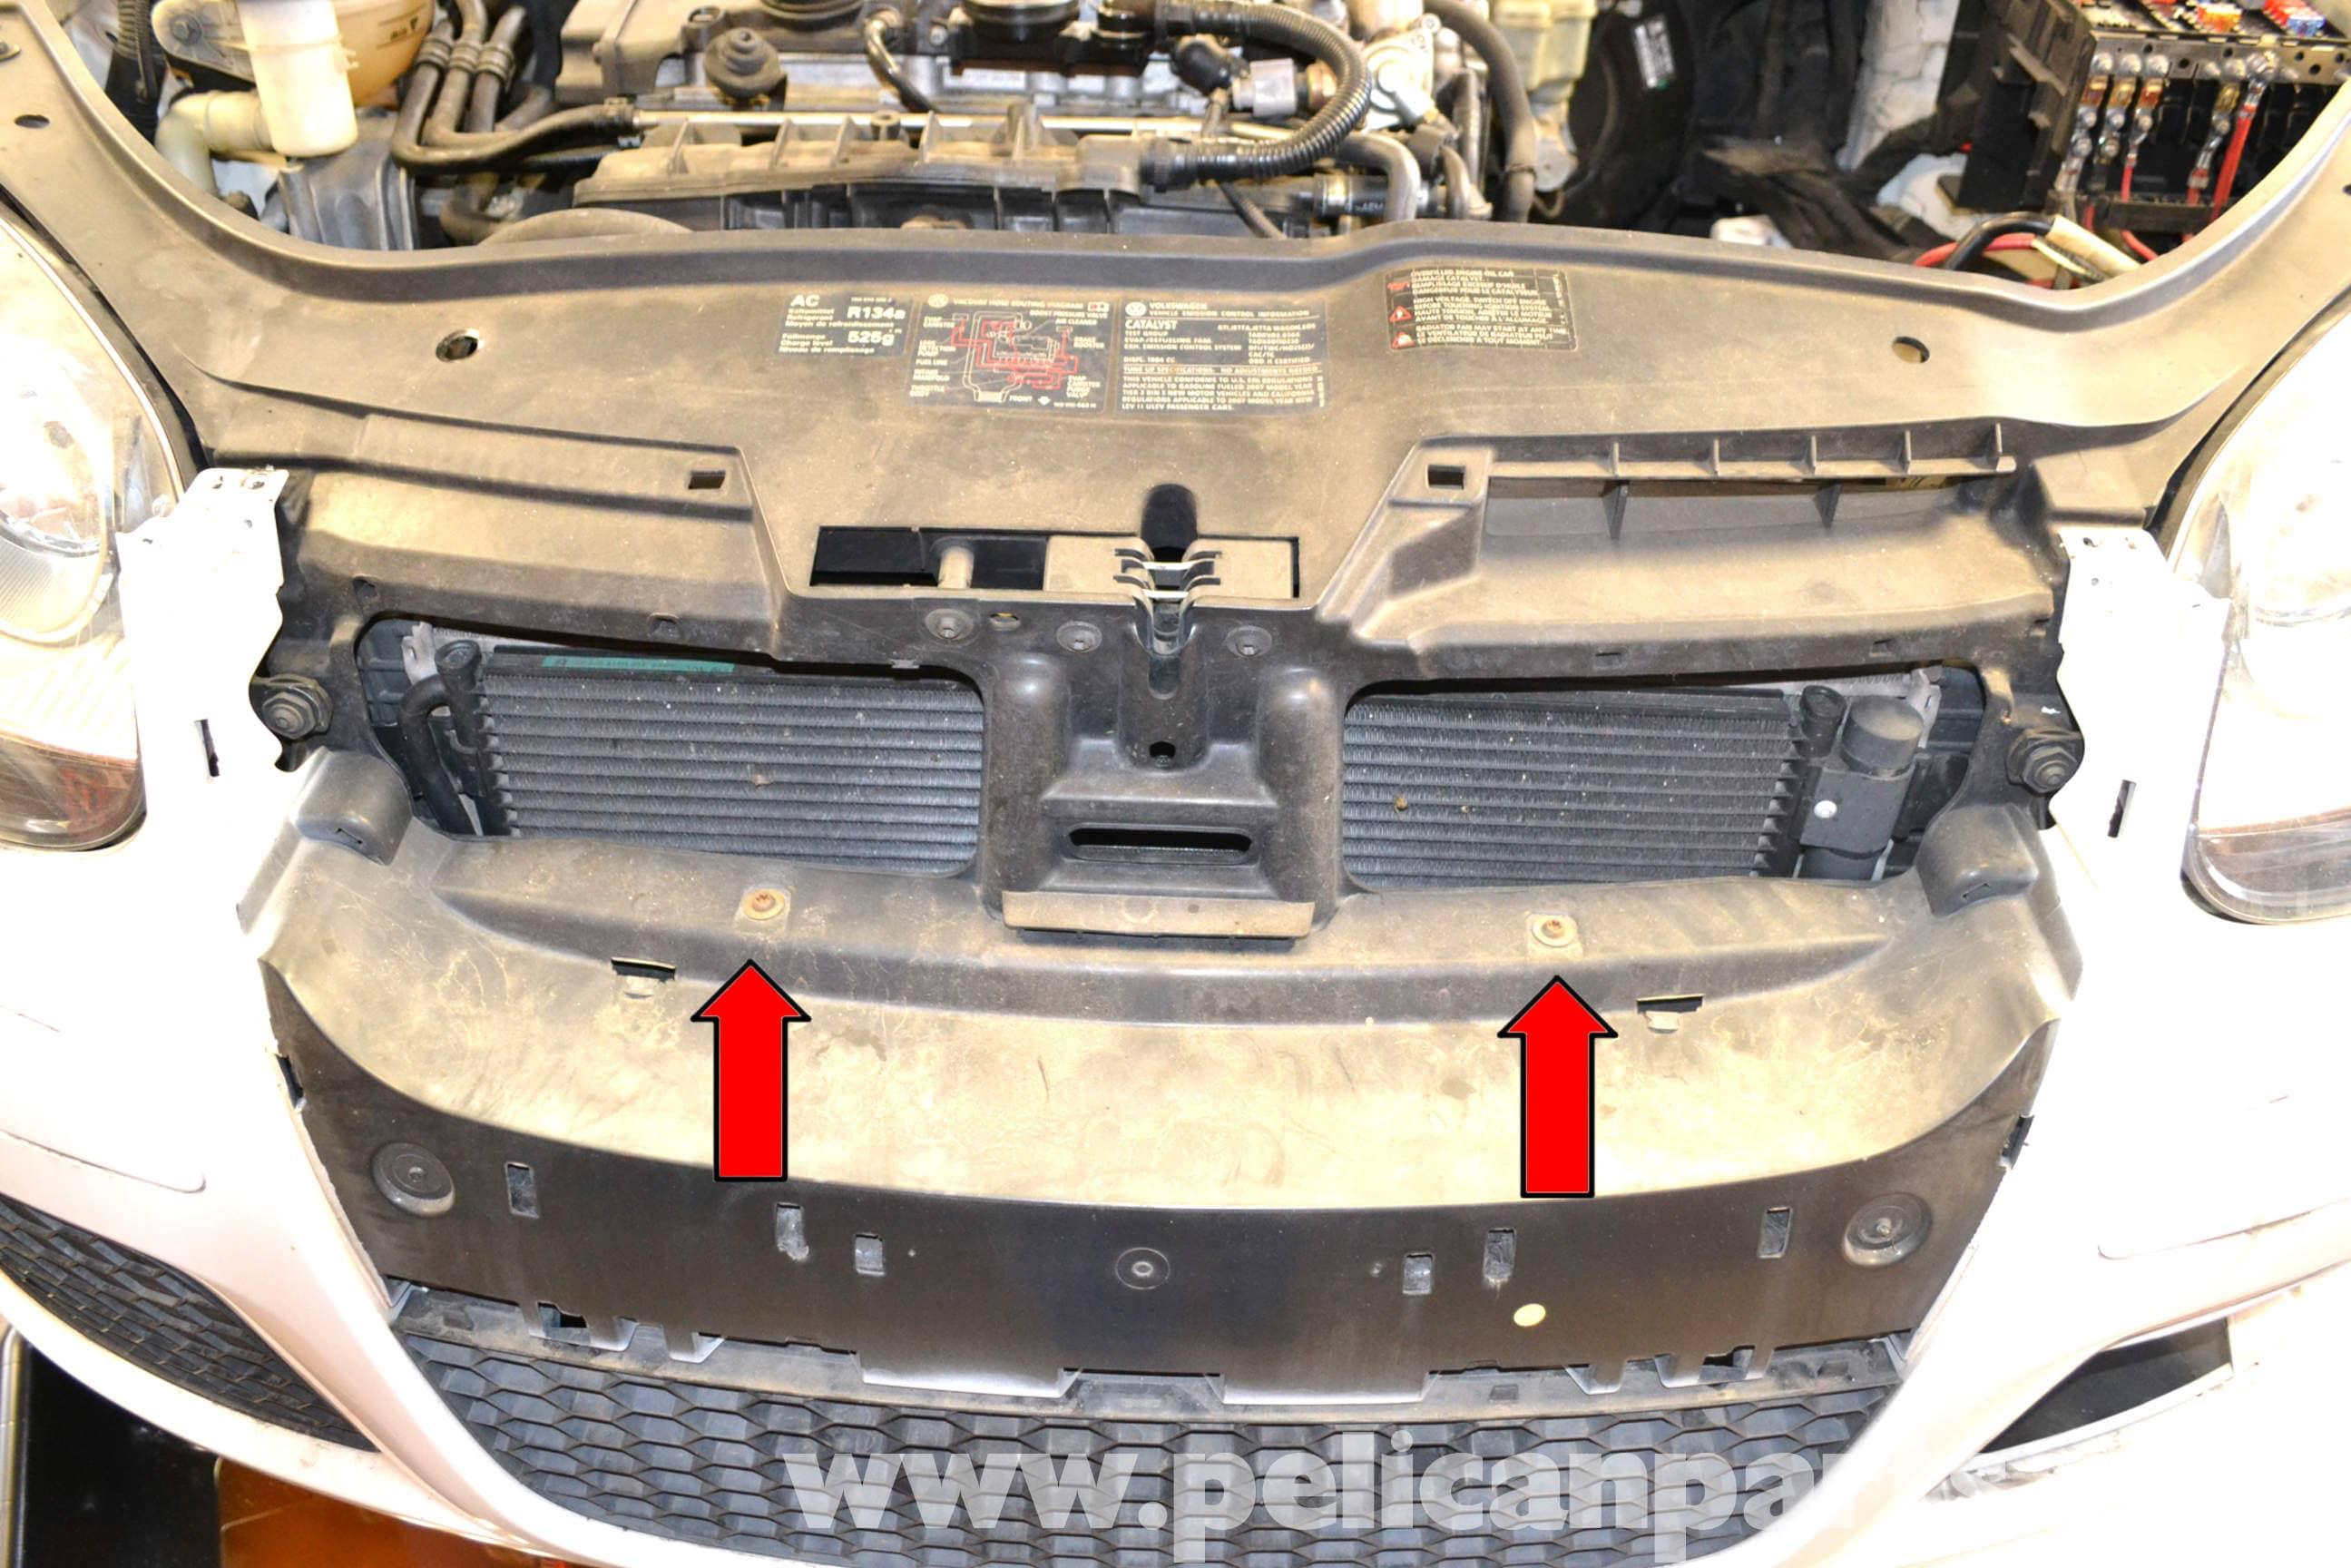 Volkswagen Golf GTI Mk V Front Bumper Removal (2006-2009) - Pelican